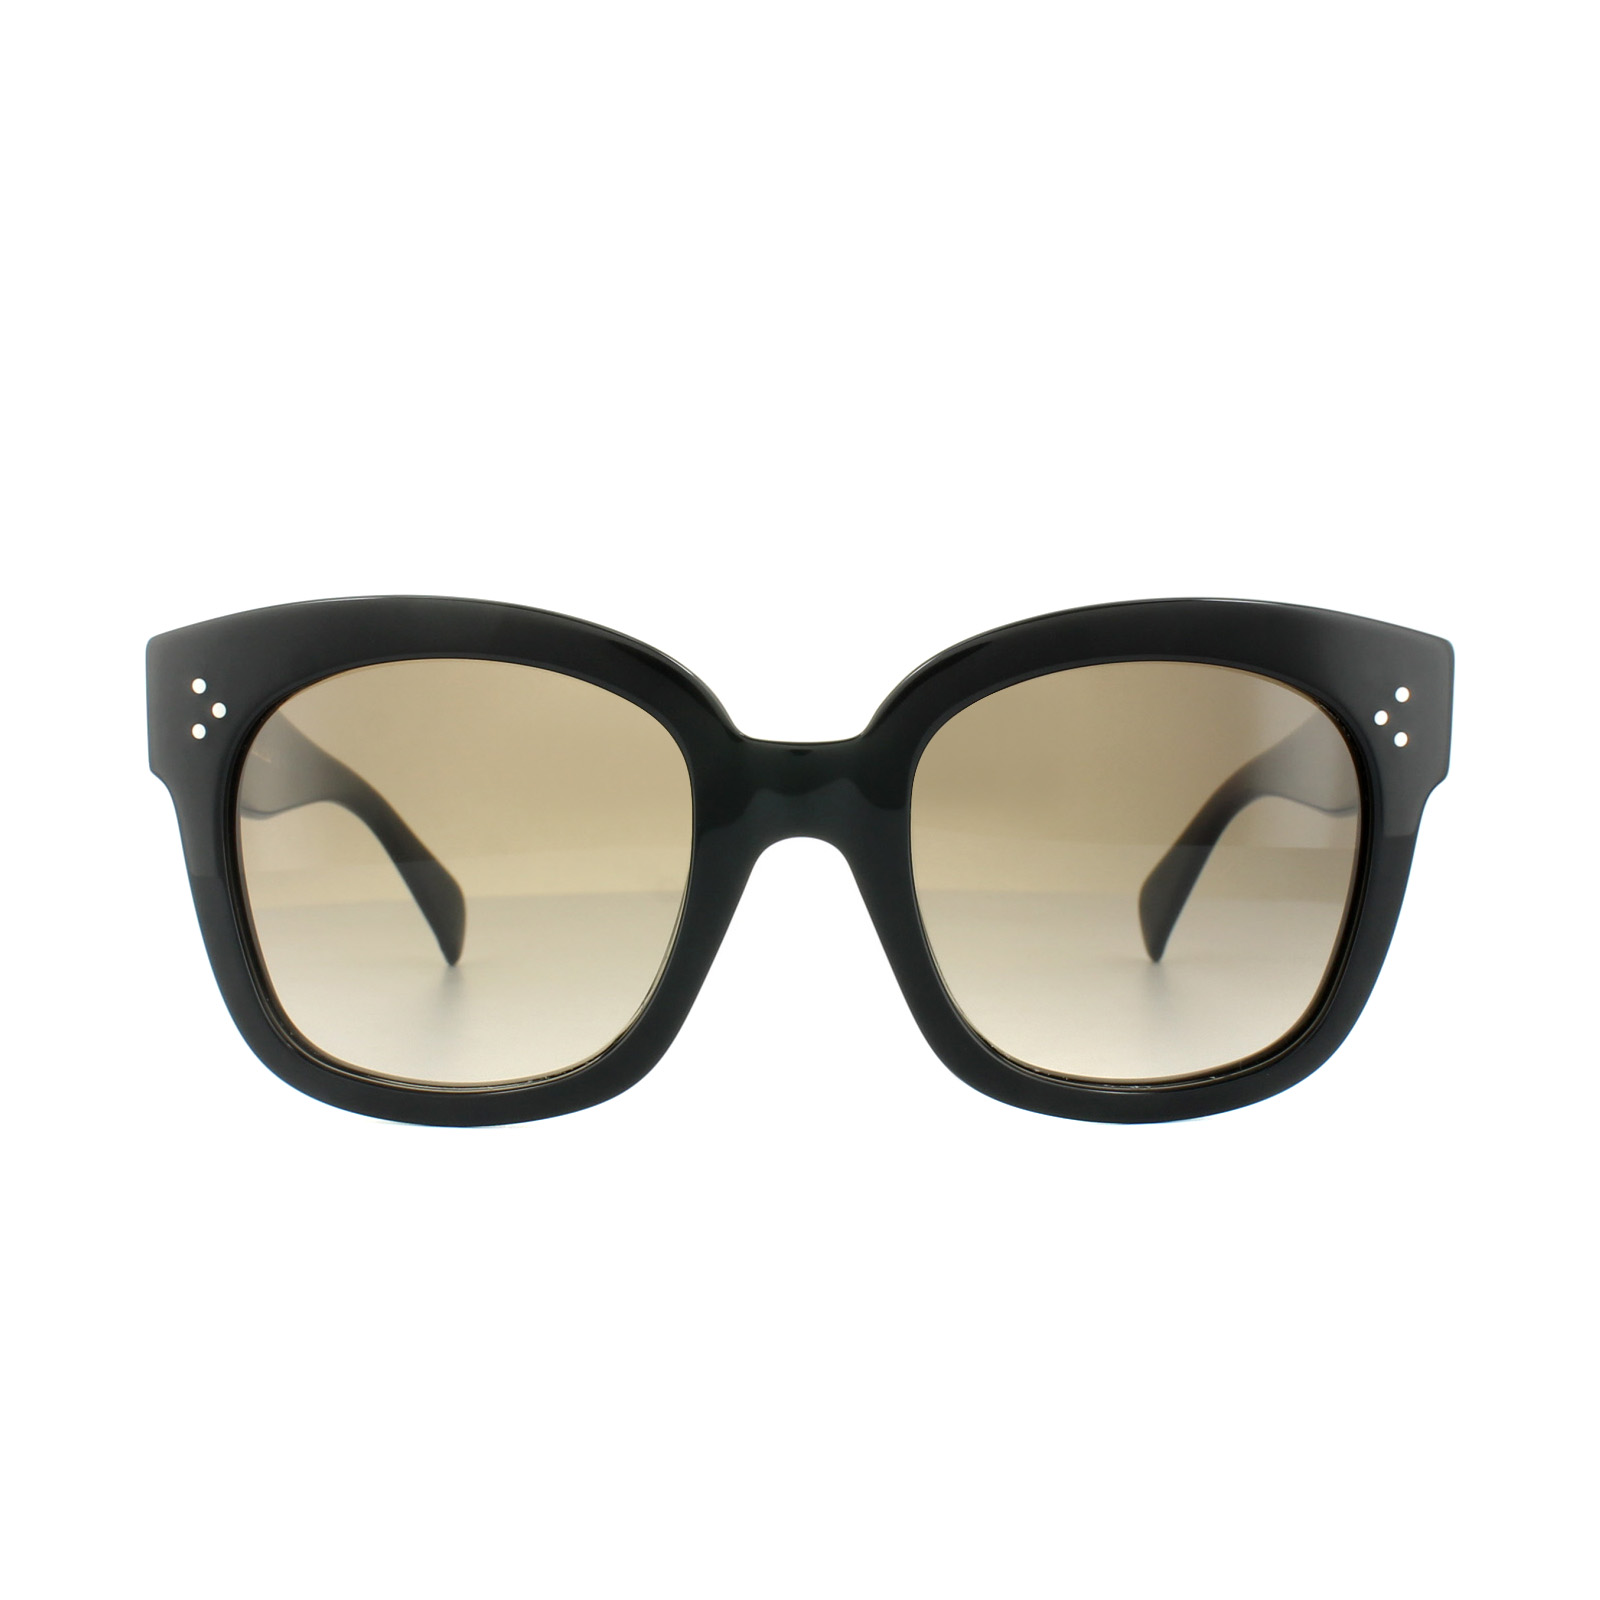 706291f991d Sentinel Celine Sunglasses 41805 S New Audrey 807 HA Black Brown Gradient.  Sentinel Thumbnail 3